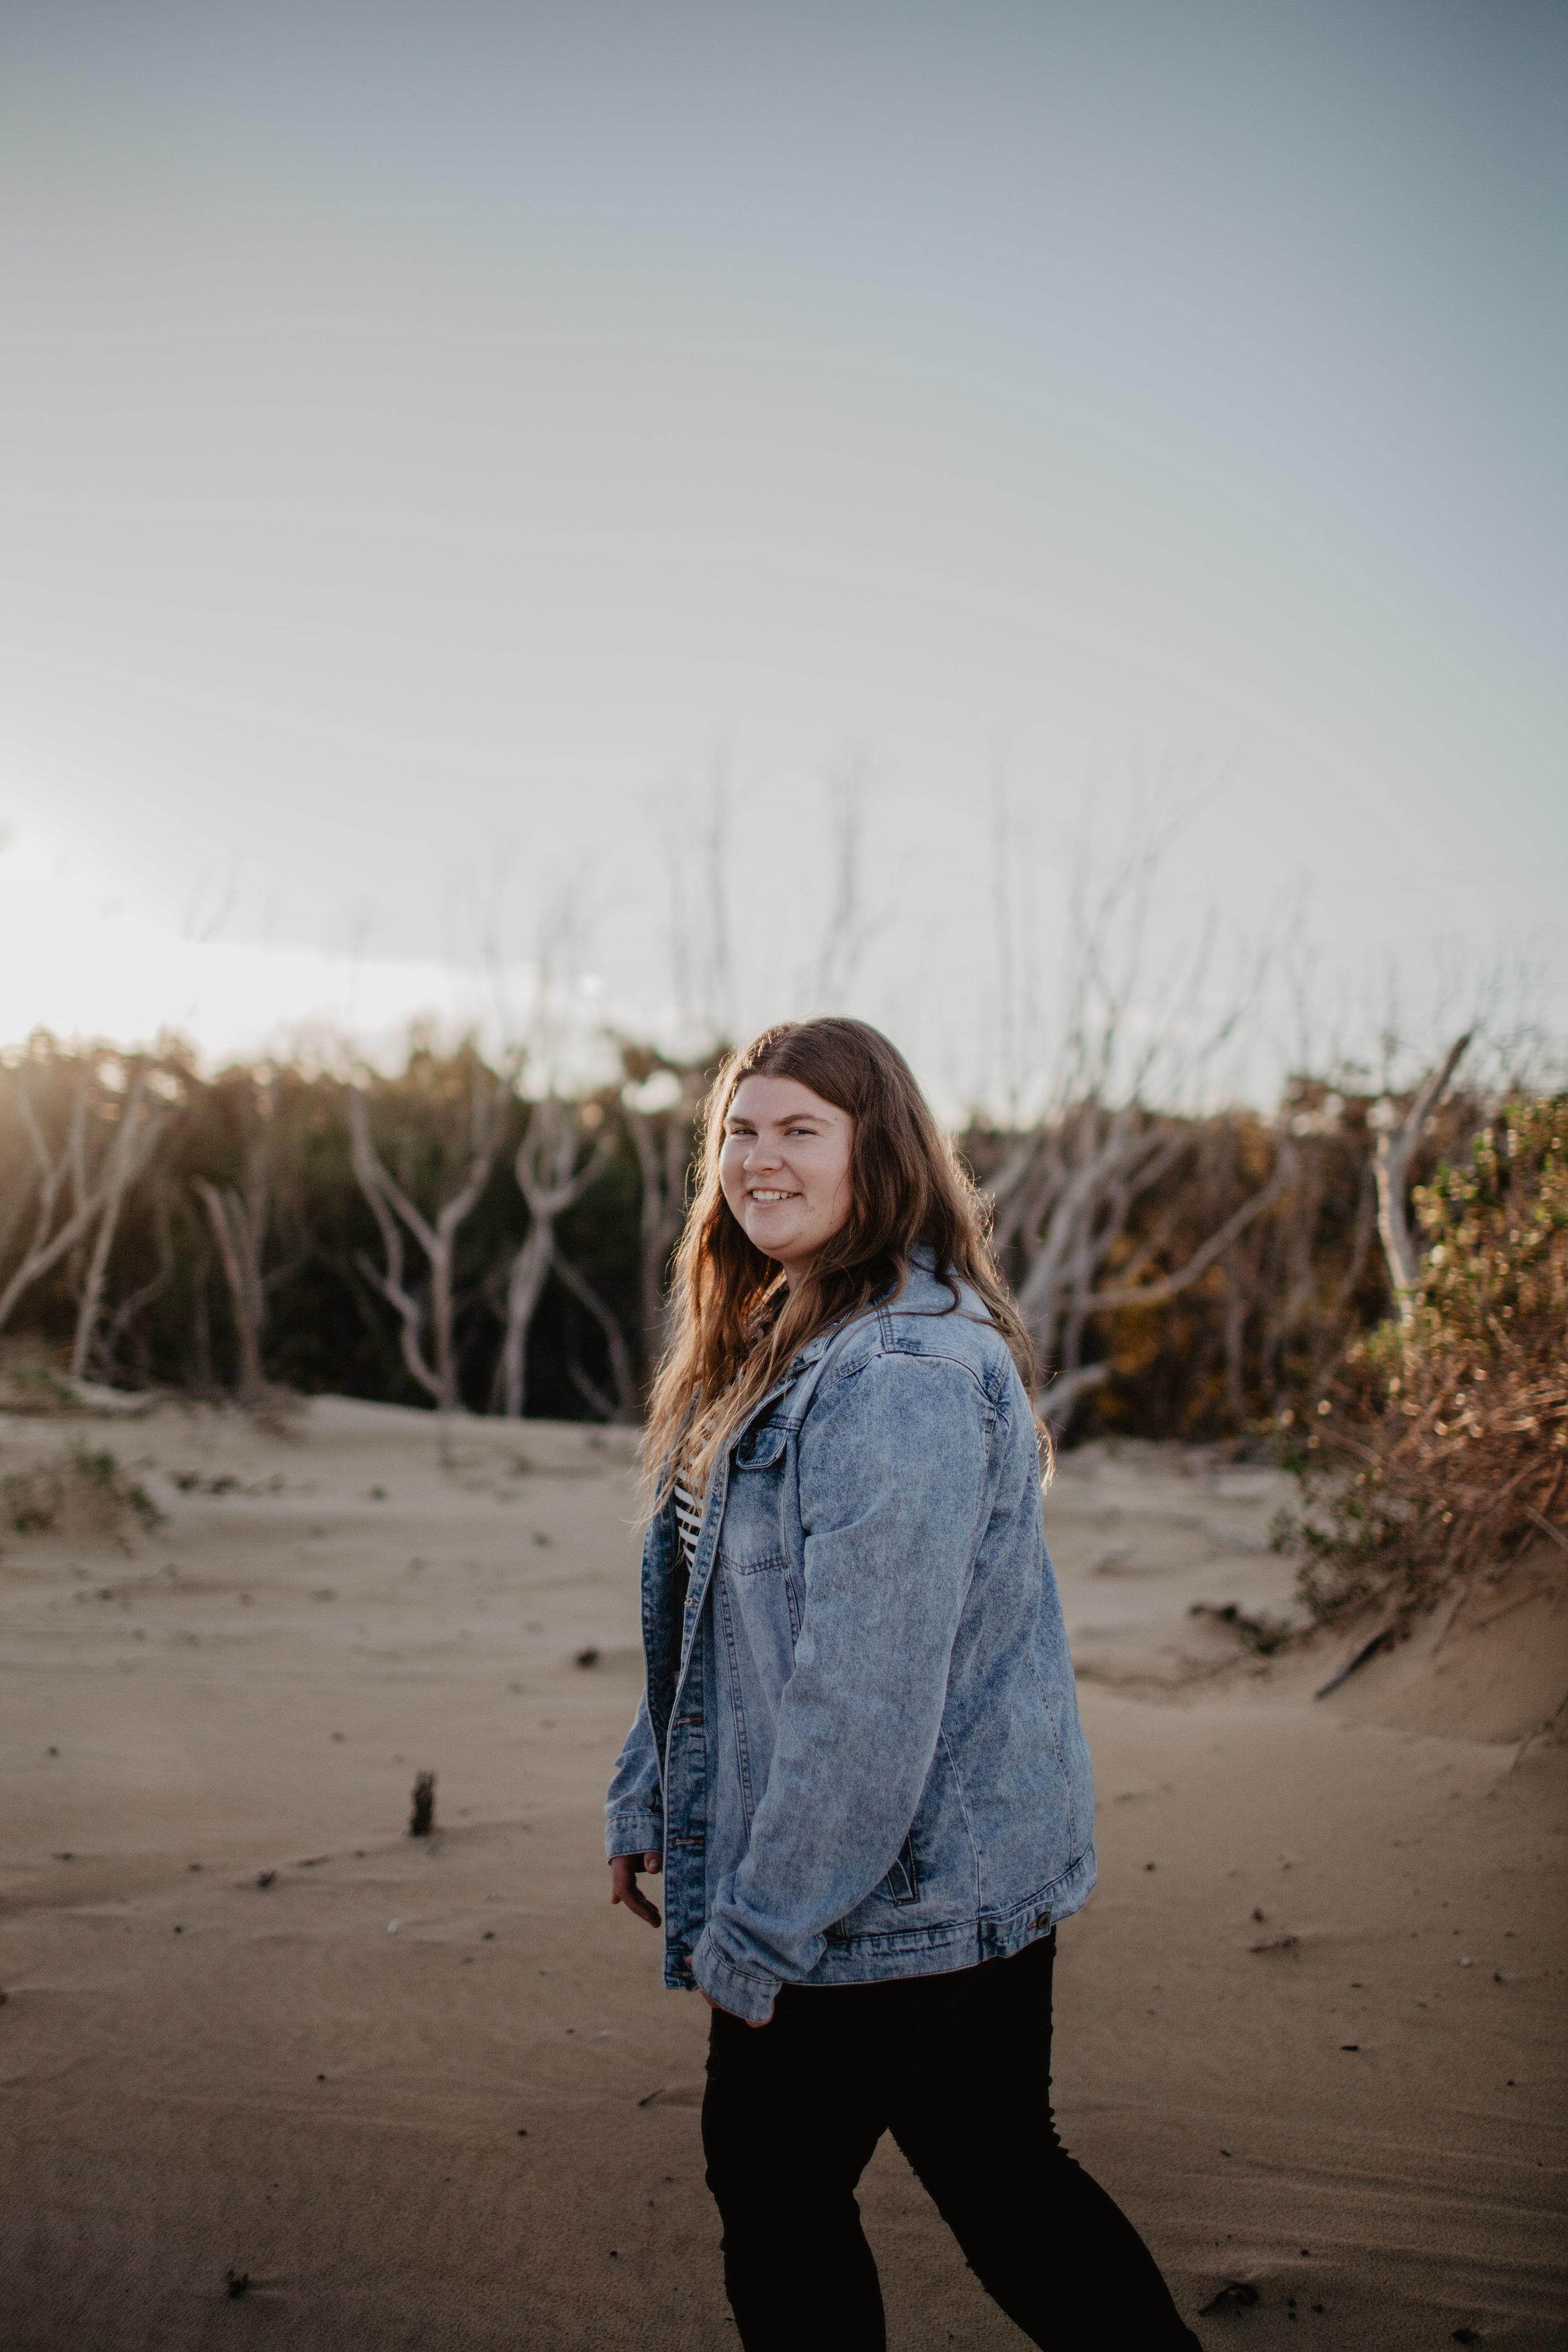 Sunset Portraits by RLC